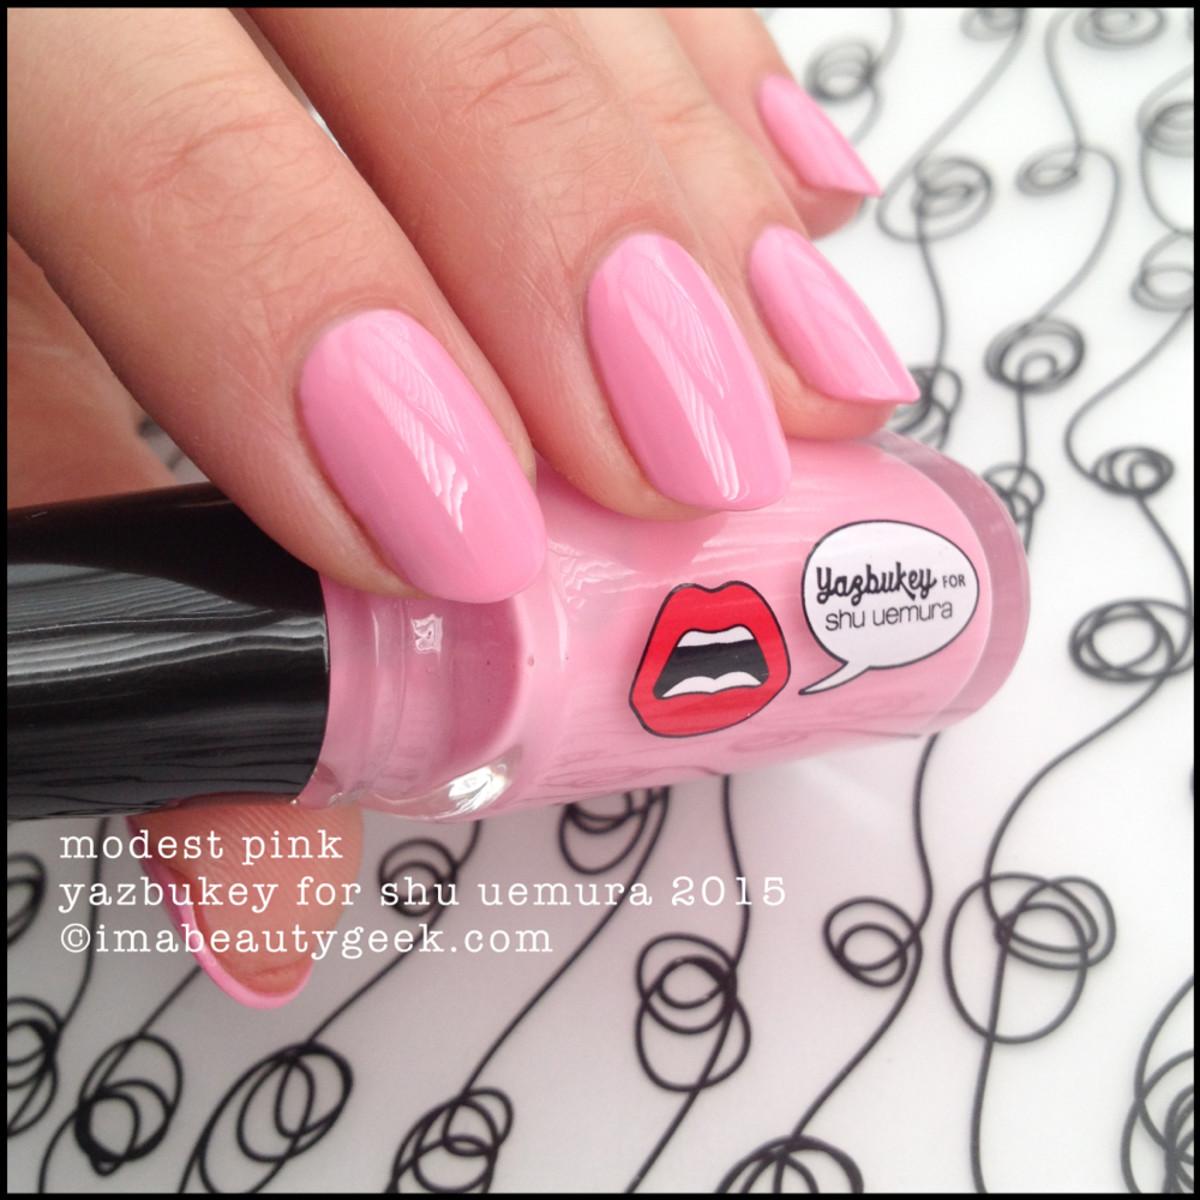 Yazbukey Polish for Shu Uemura Modest Pink 2015